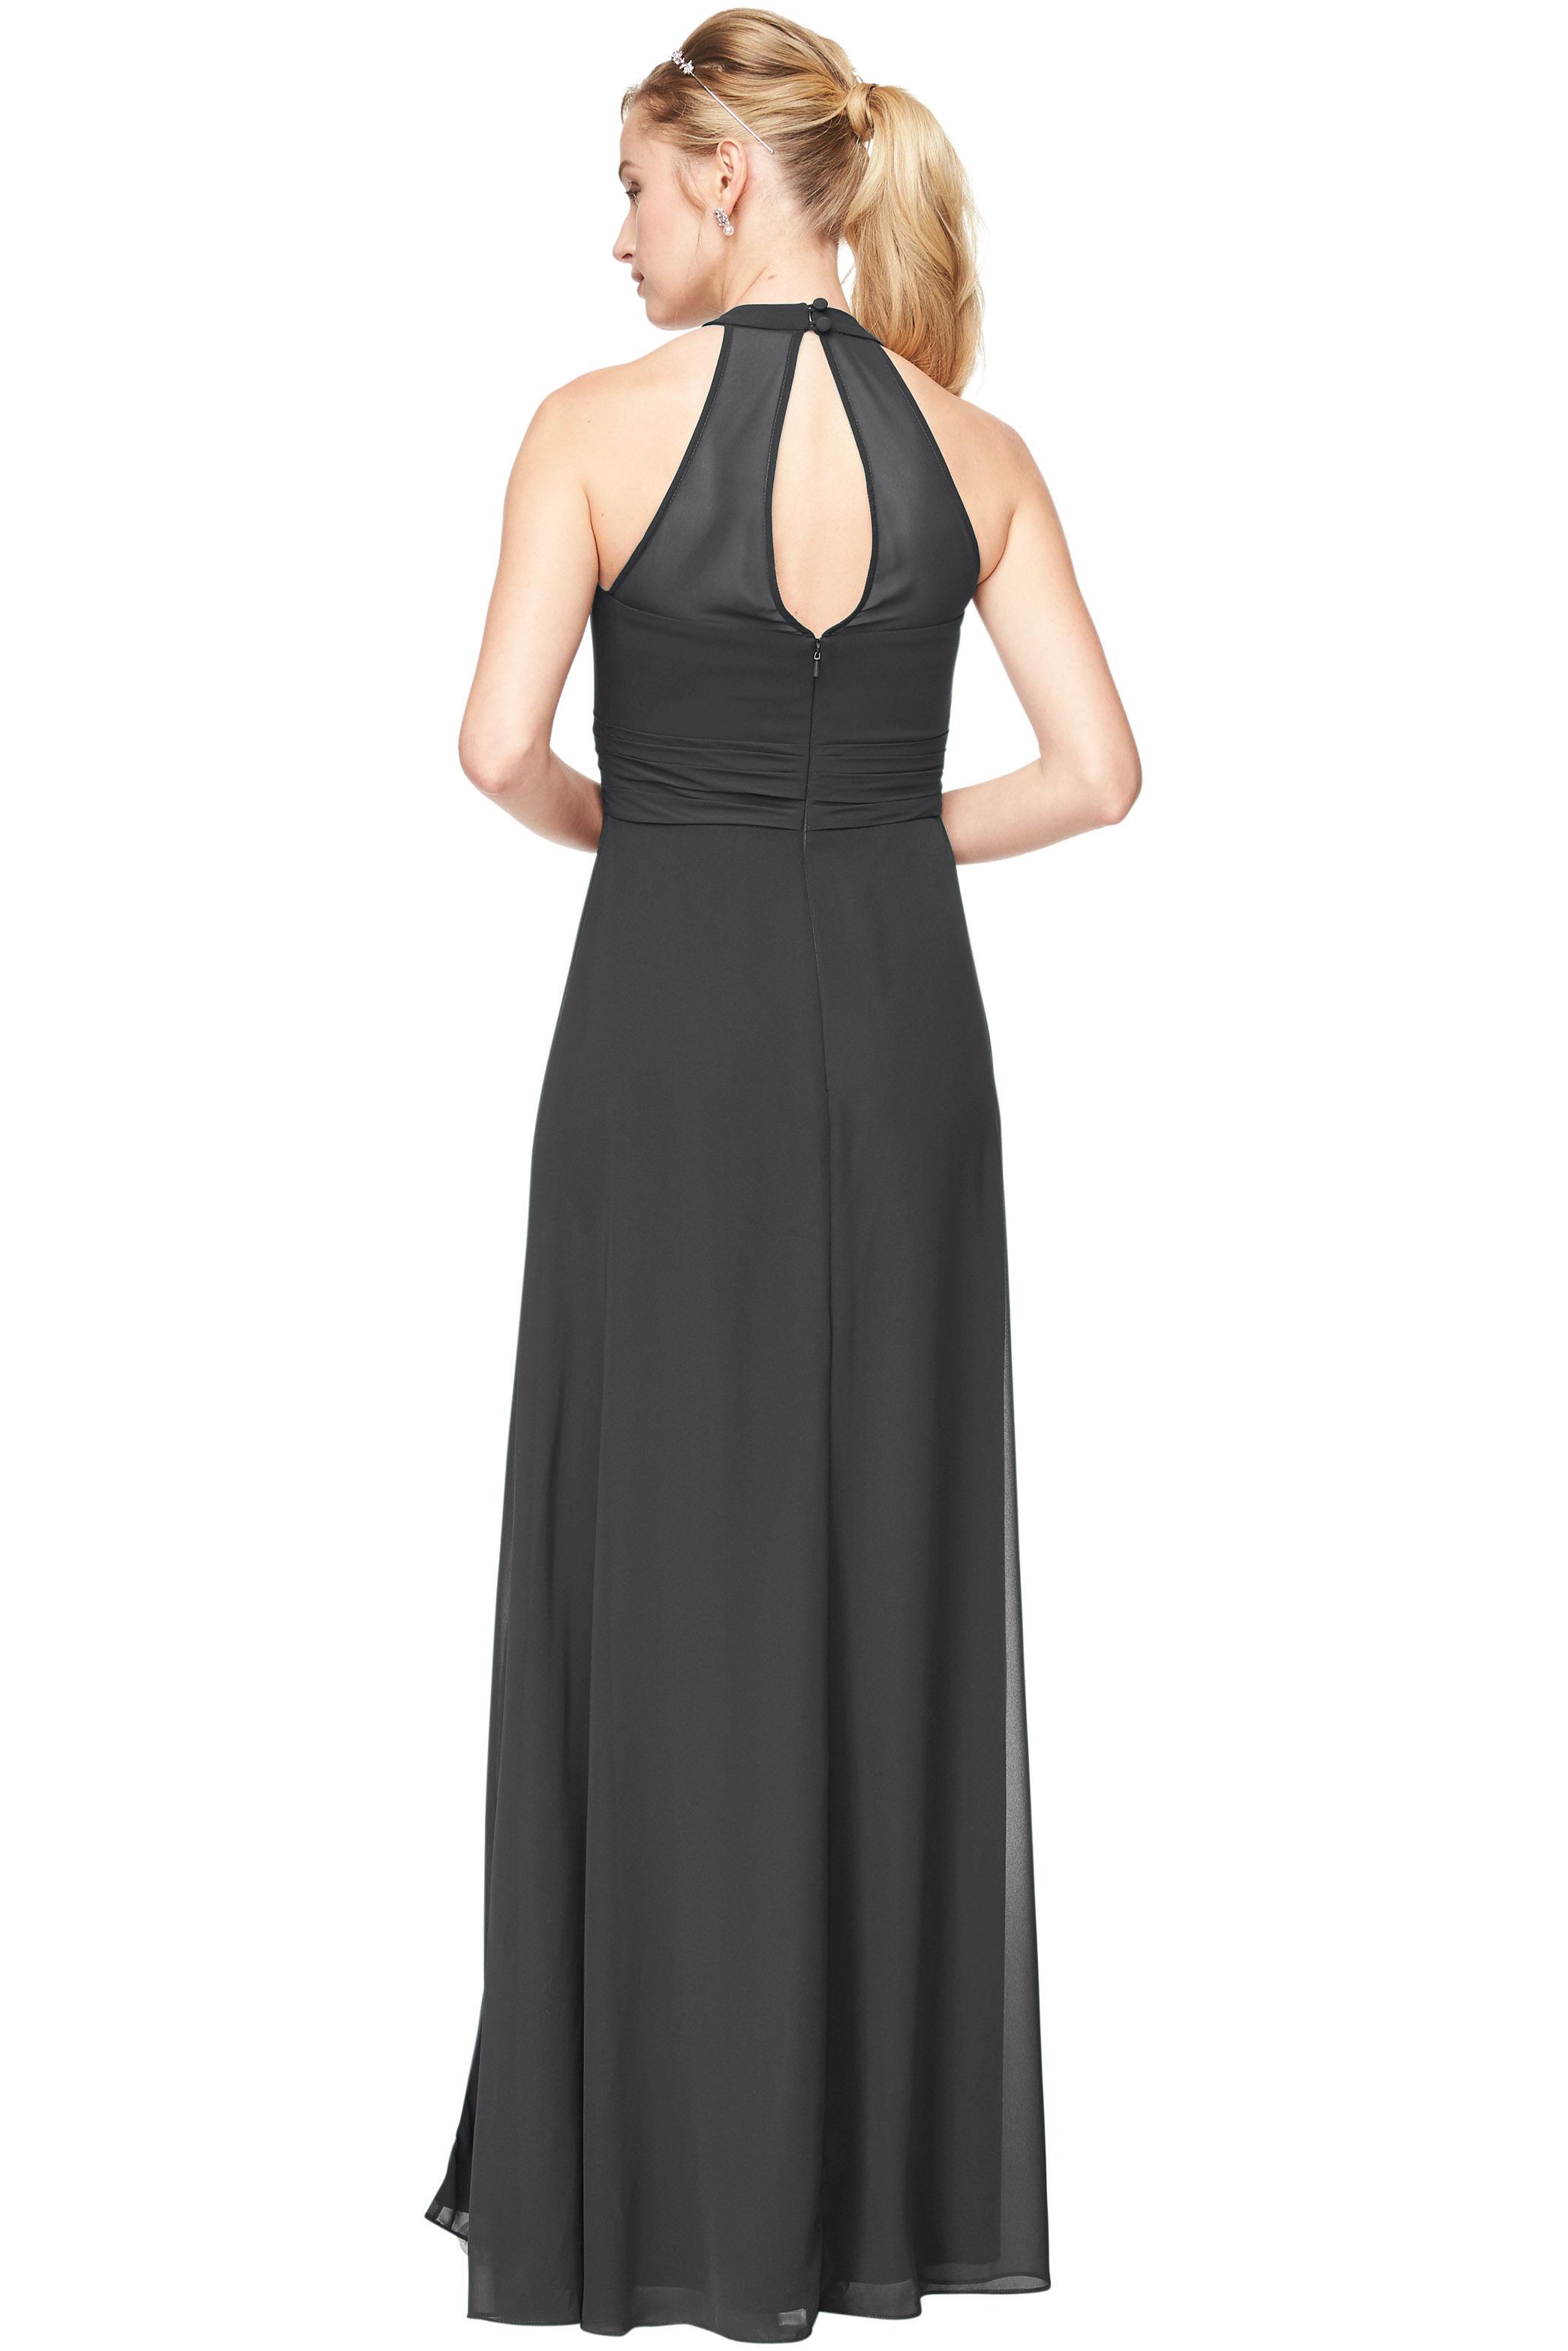 Bill Levkoff CHARCOAL Chiffon V-Neck A-Line gown, $198.00 Back